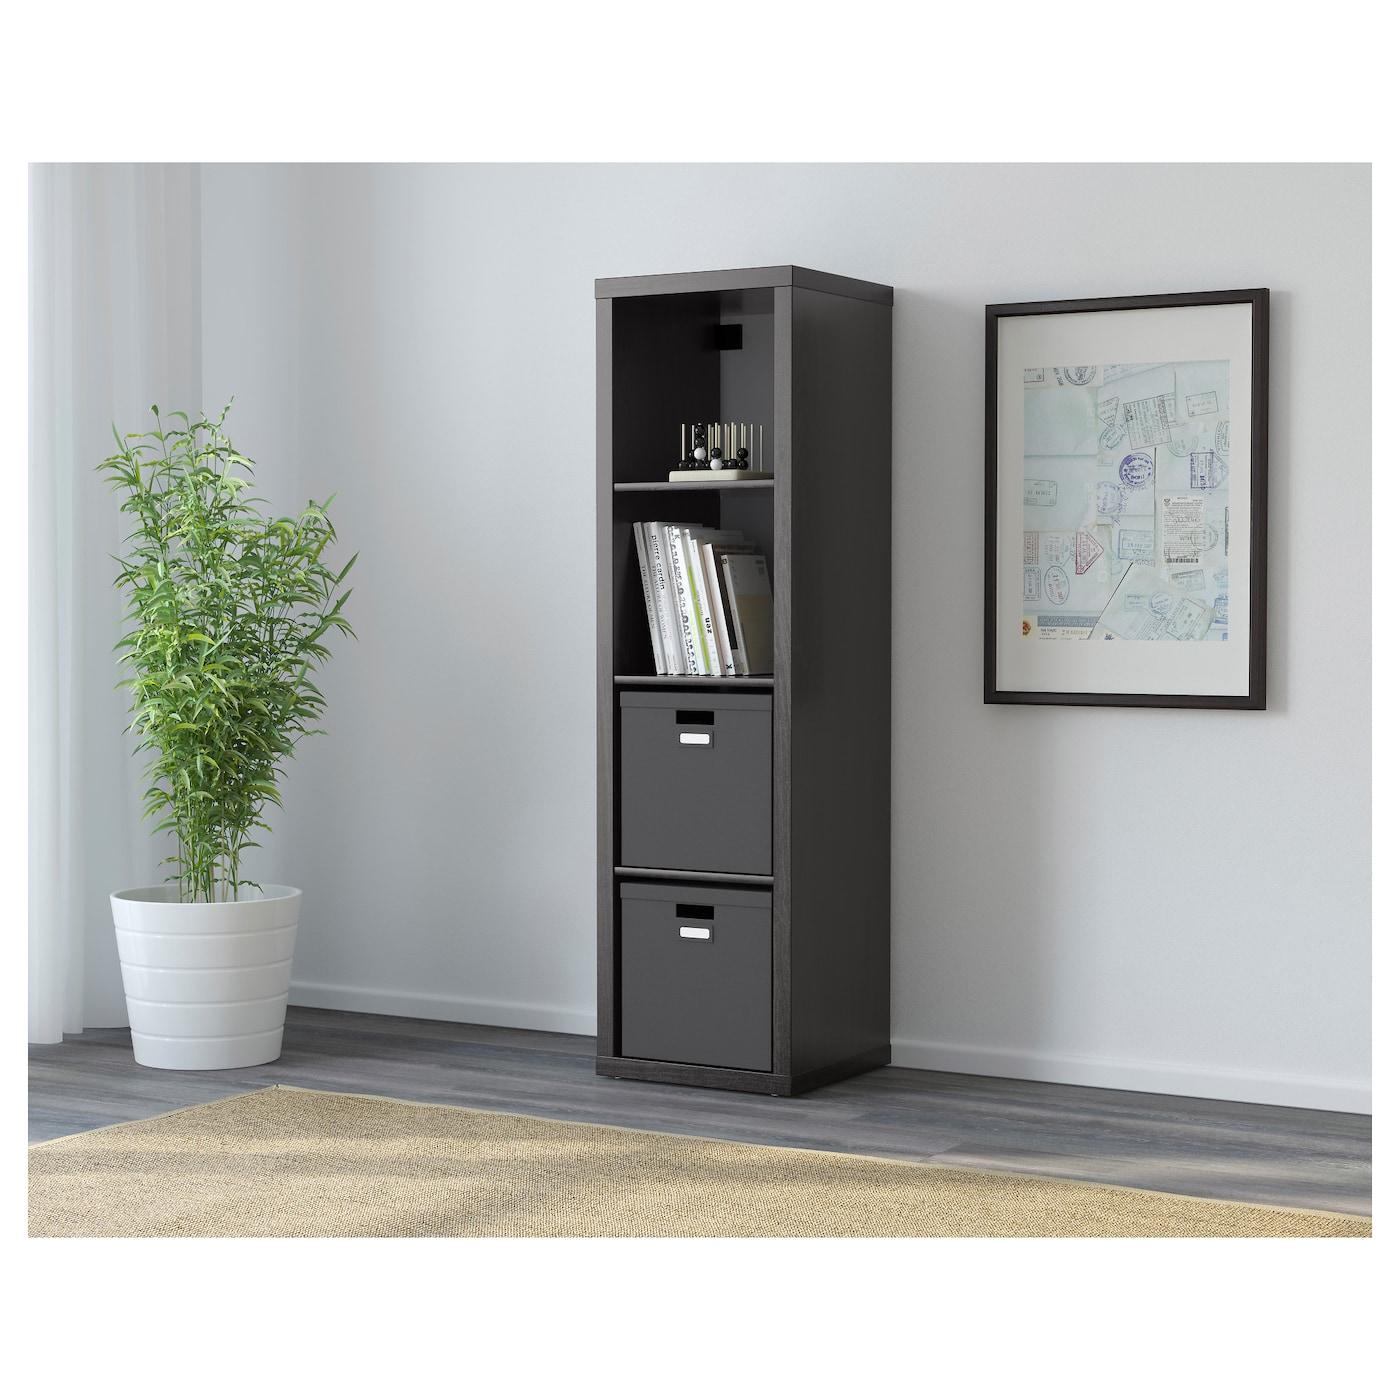 kallax shelving unit black brown 42 x 147 cm ikea. Black Bedroom Furniture Sets. Home Design Ideas